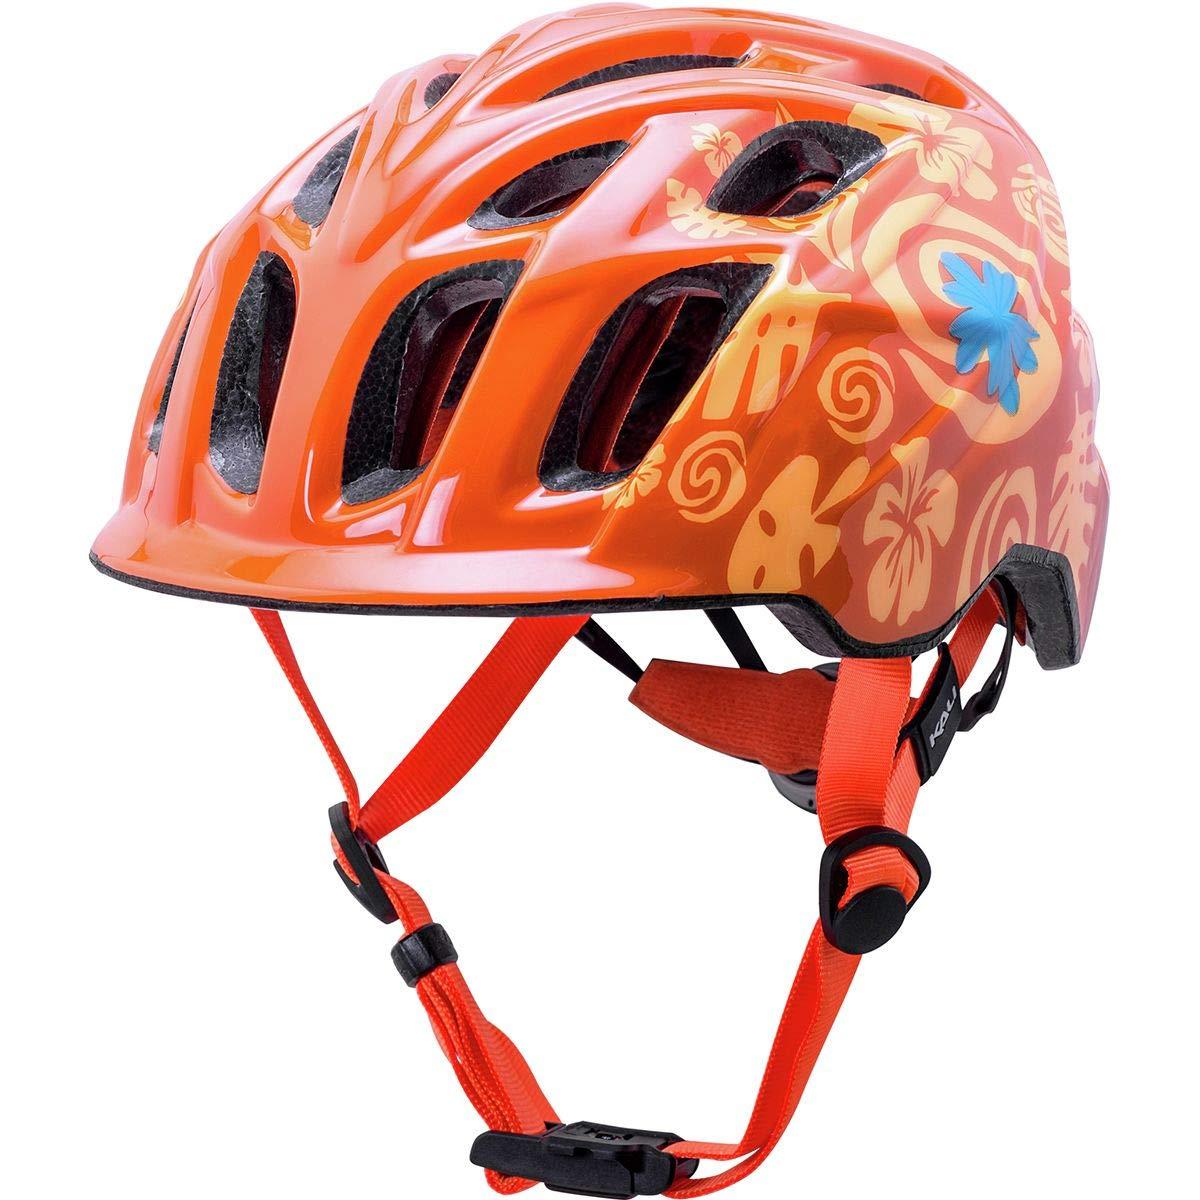 Kali Protectives Chakra Child Helmet - Kids' Tropical Orange, One Size